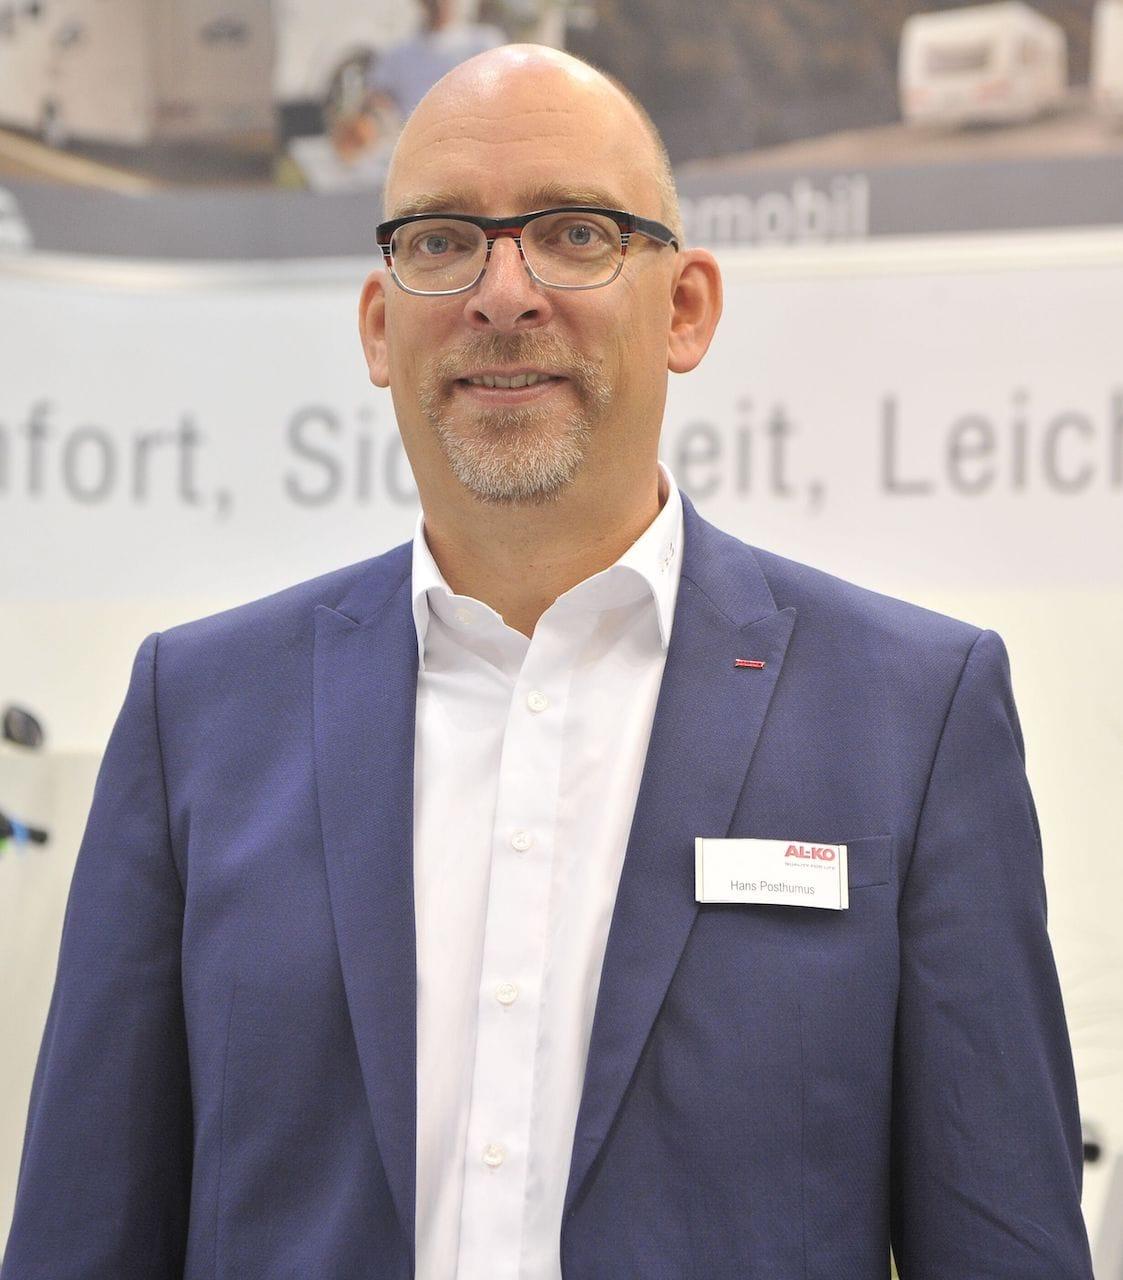 Hans Posthumus - Leiter Marketing AL-KO Fahrzeugtechnik